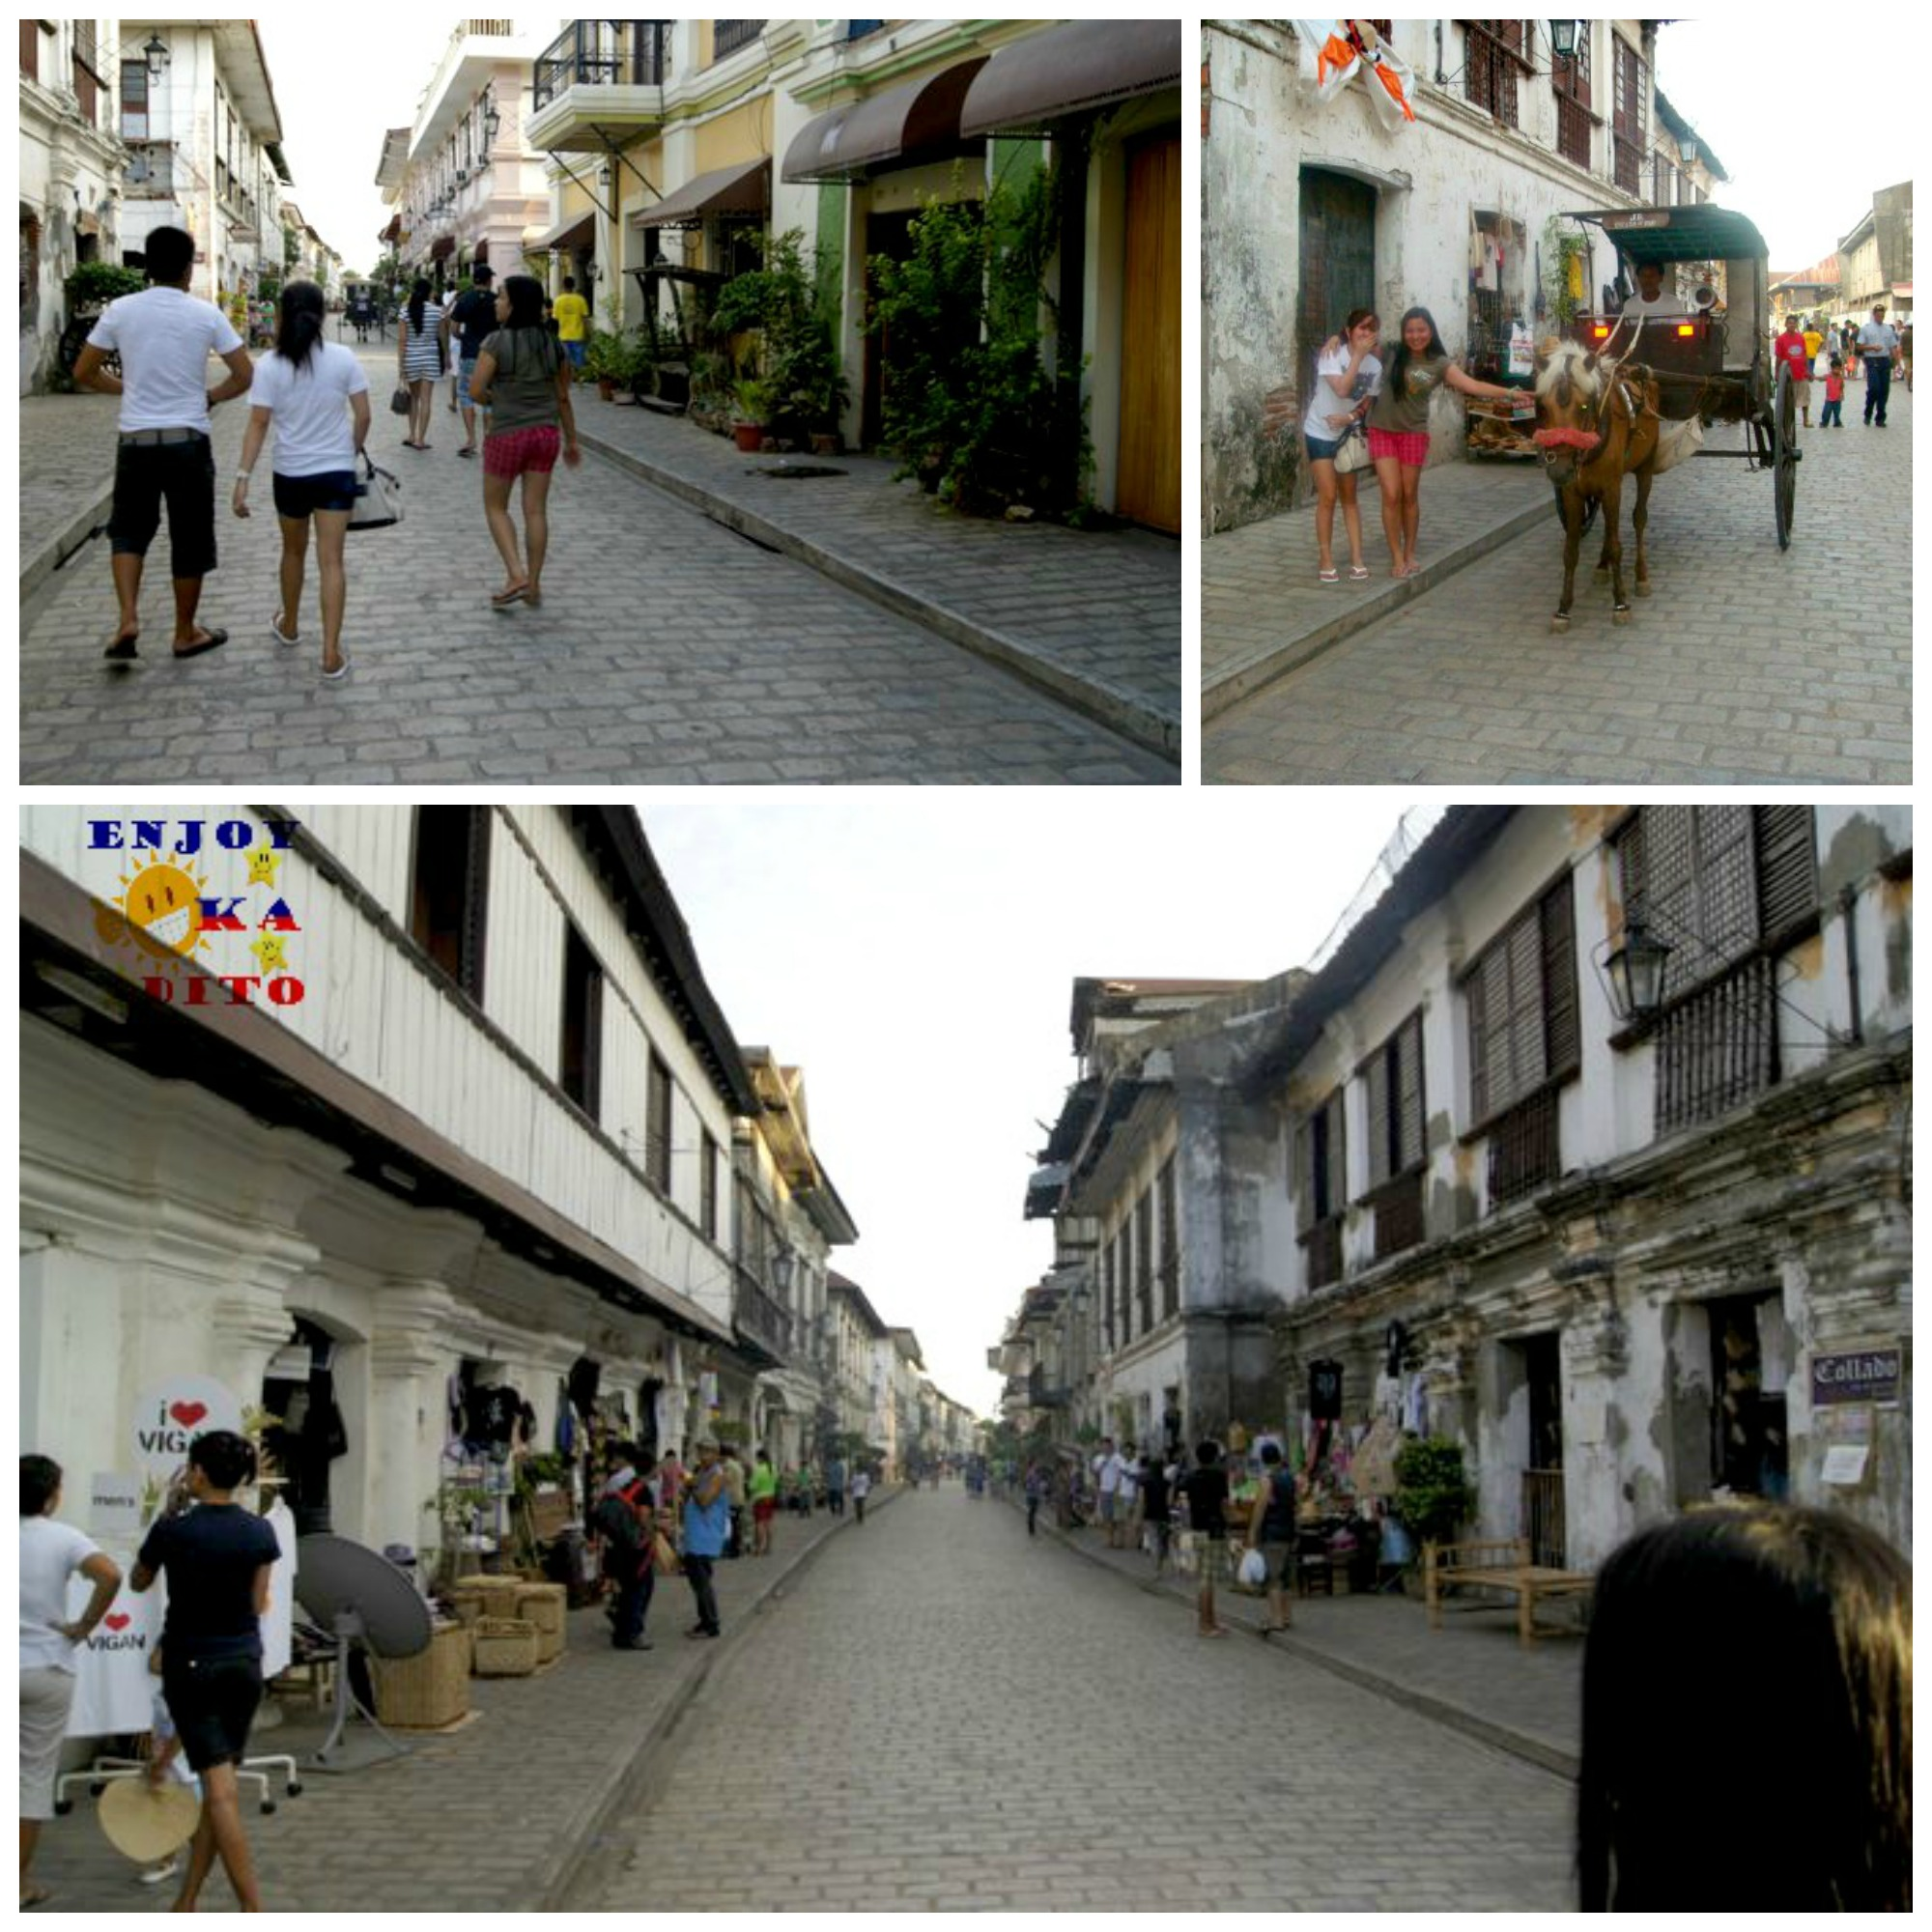 tour package enjoy ka dito Pagudpud, Vigan Ilocos.jpg